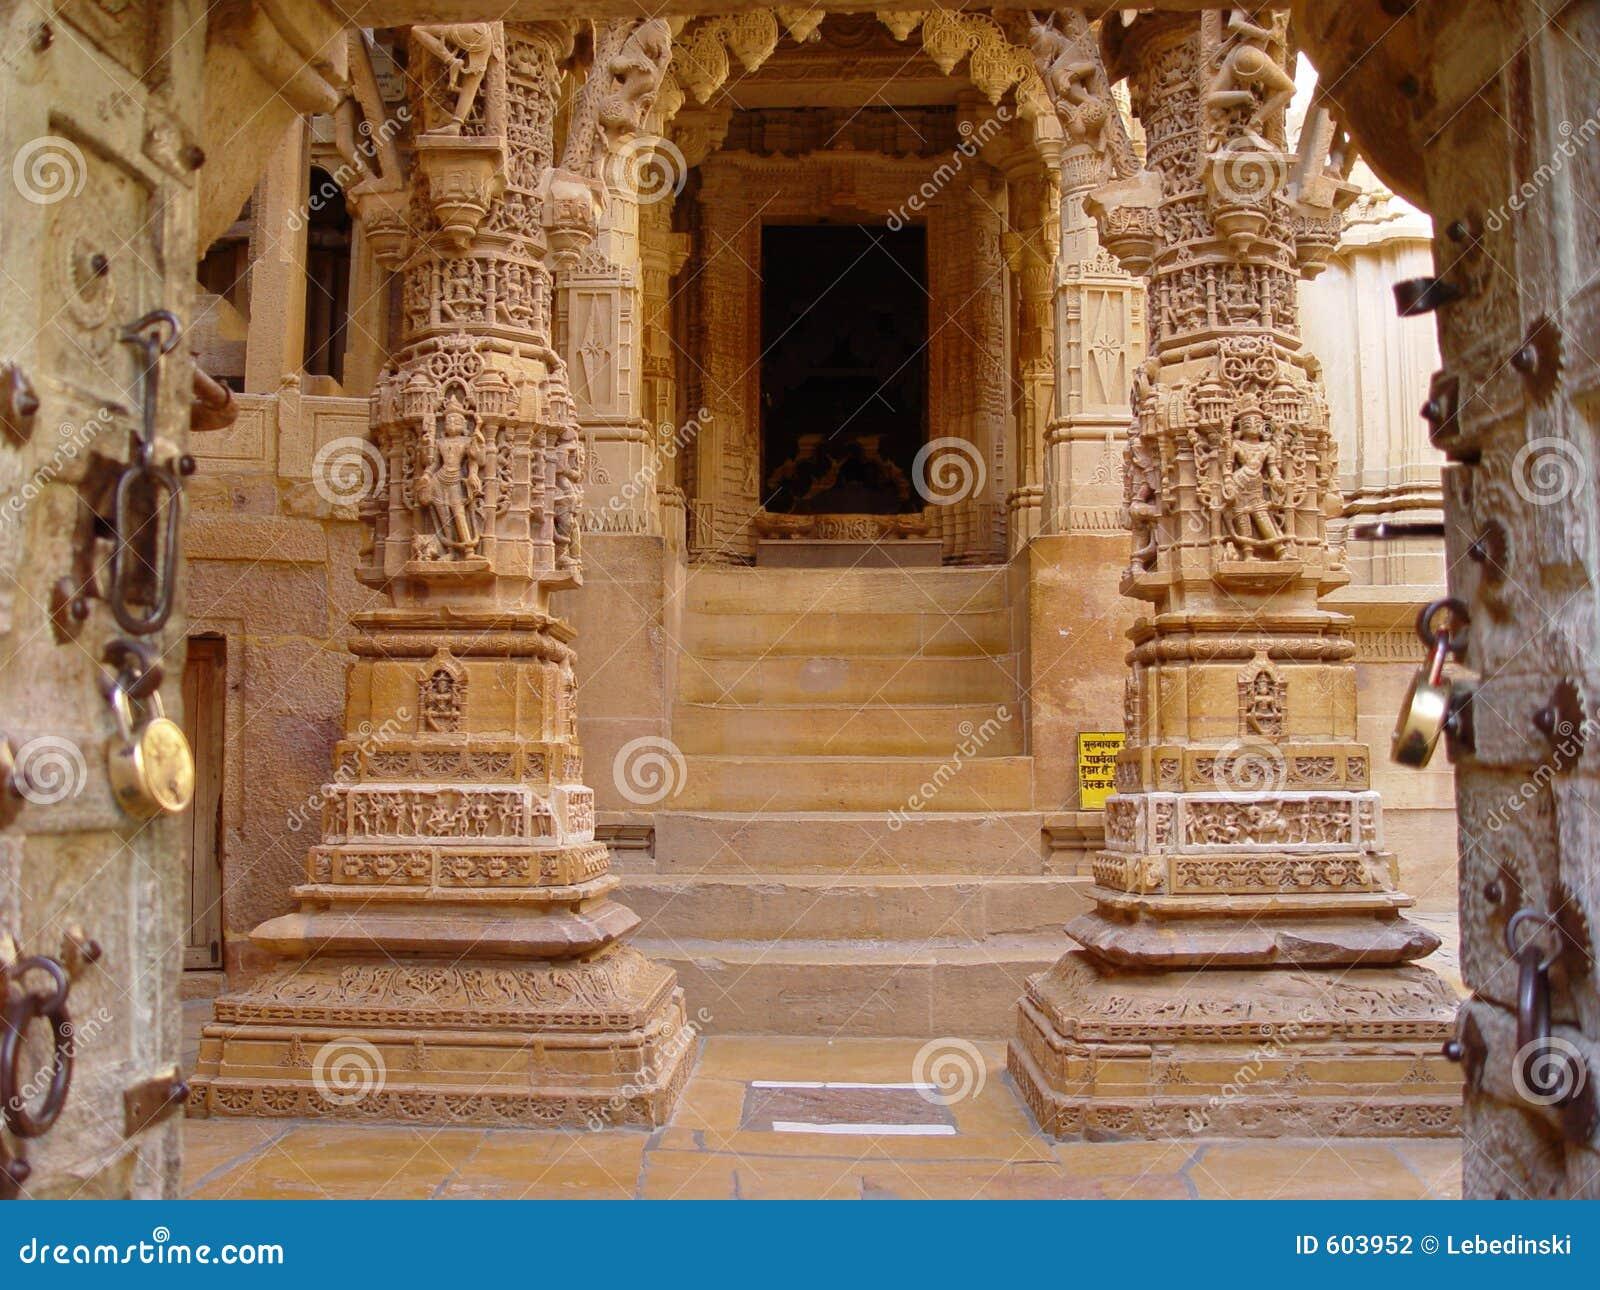 yellow stone jaisalmer stock photo image of carvings